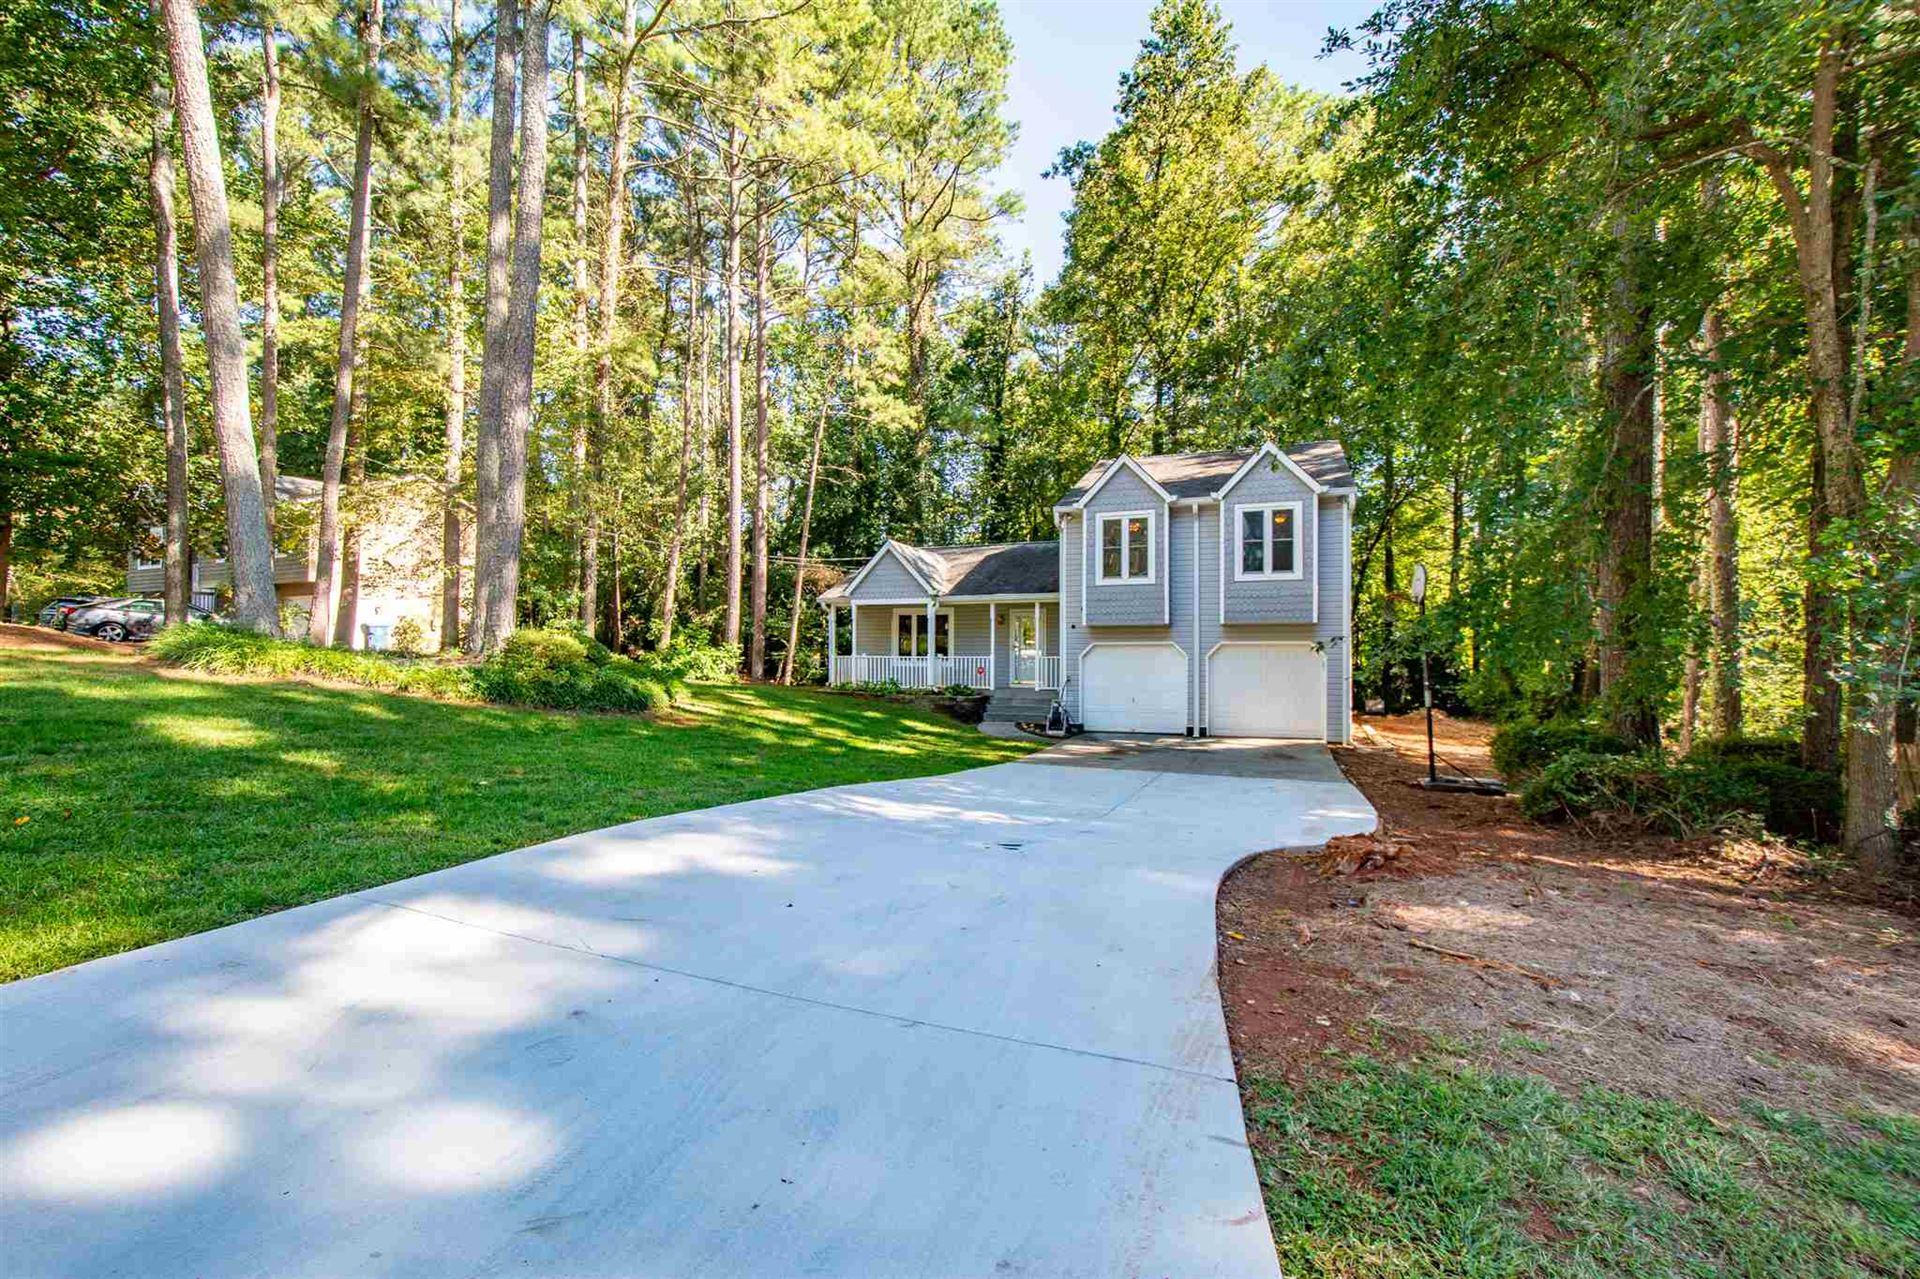 2478 Shamrock Way, Lawrenceville, GA 30044 - MLS#: 8868059